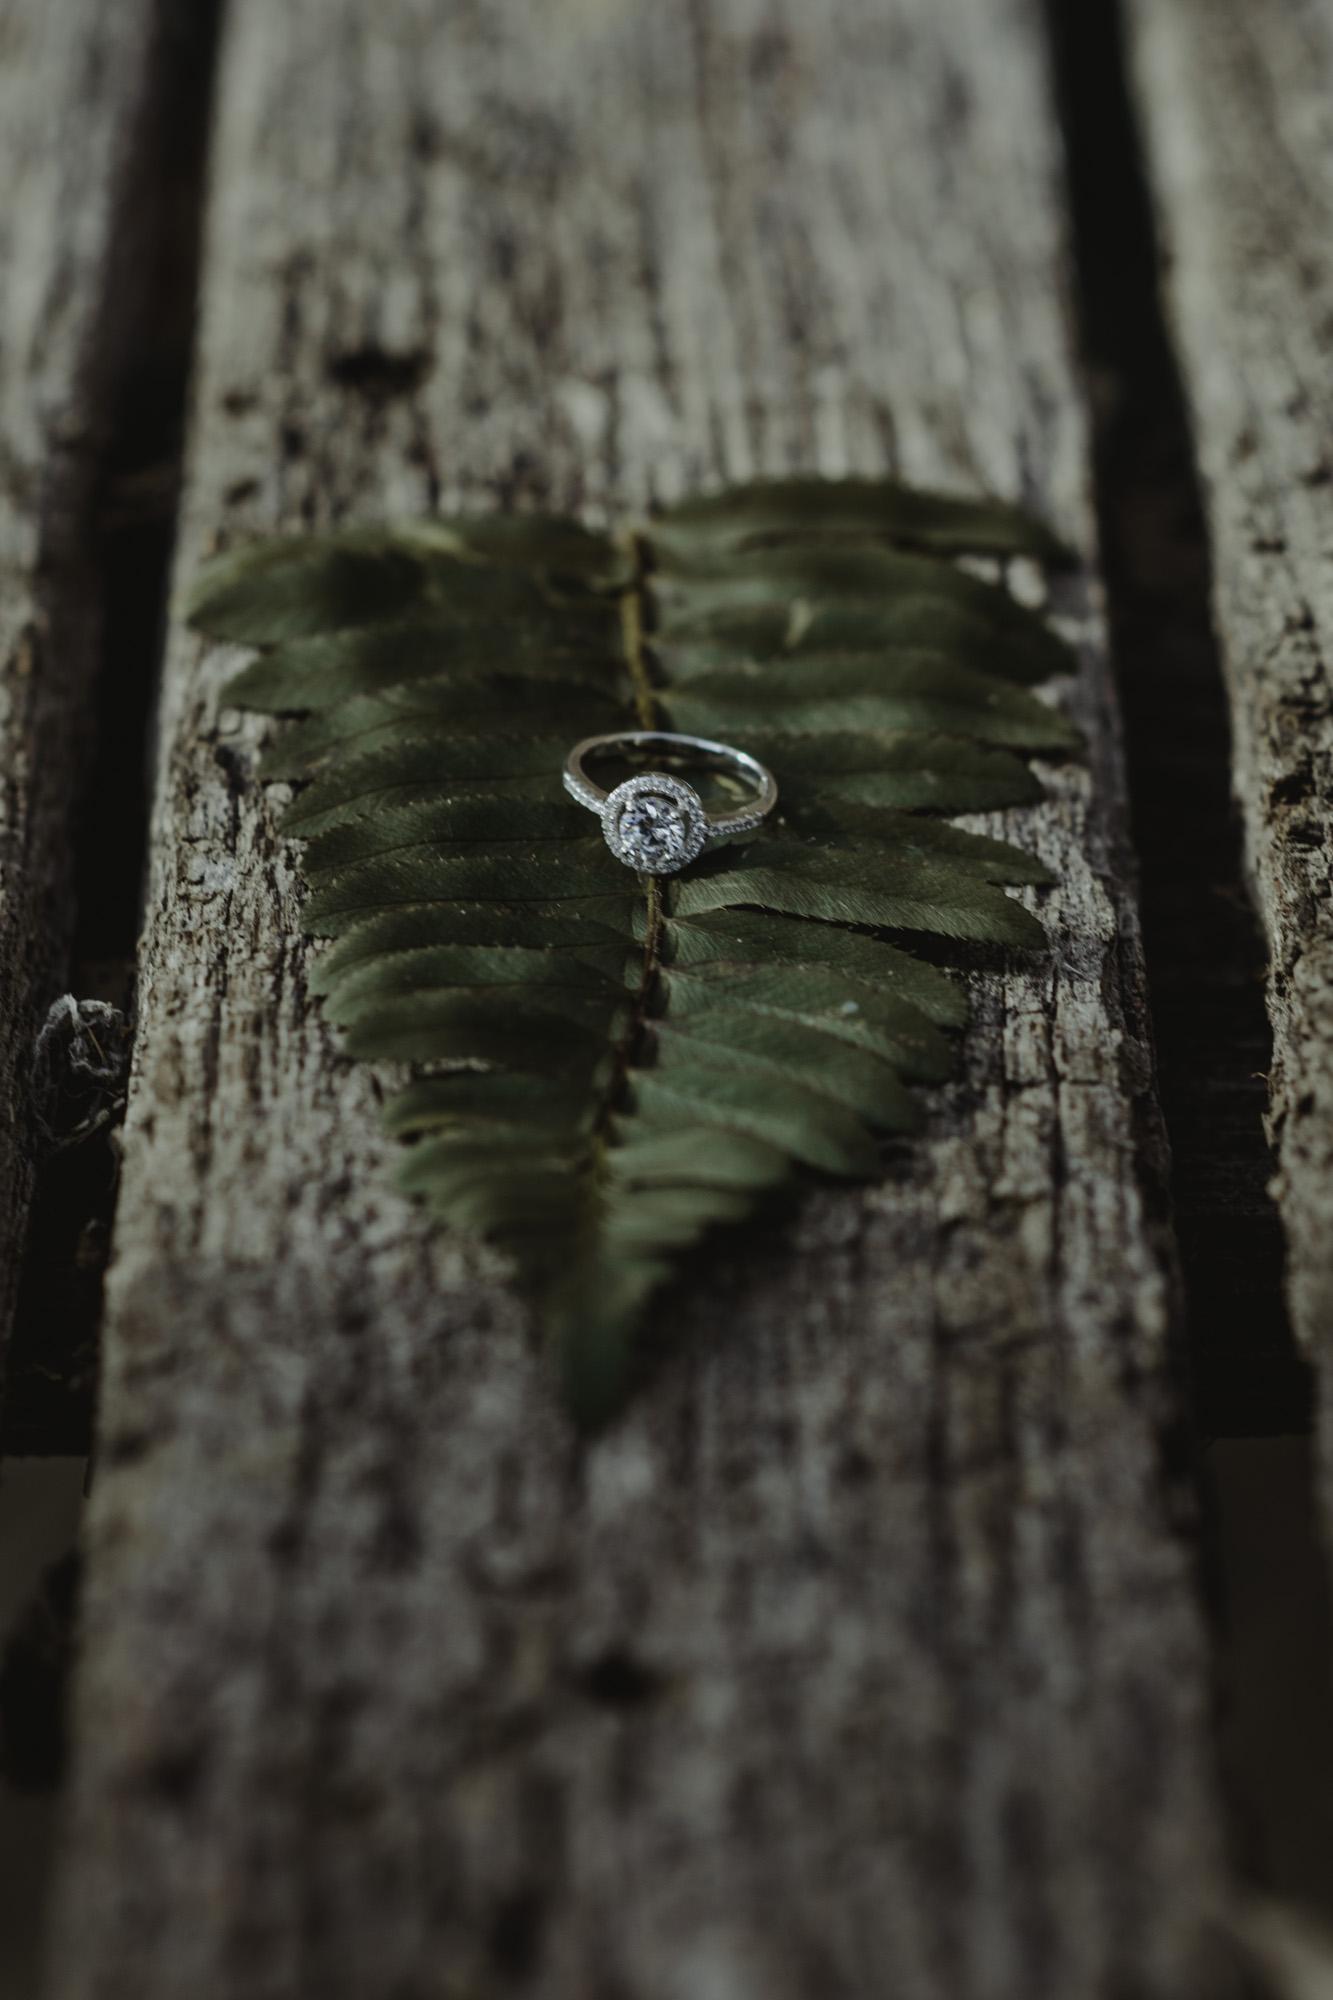 Cate_Ann_Photography_Dayton_Ohio_Wedding_Elopement_And_Engagement_PhotographerDSC_5688.jpg